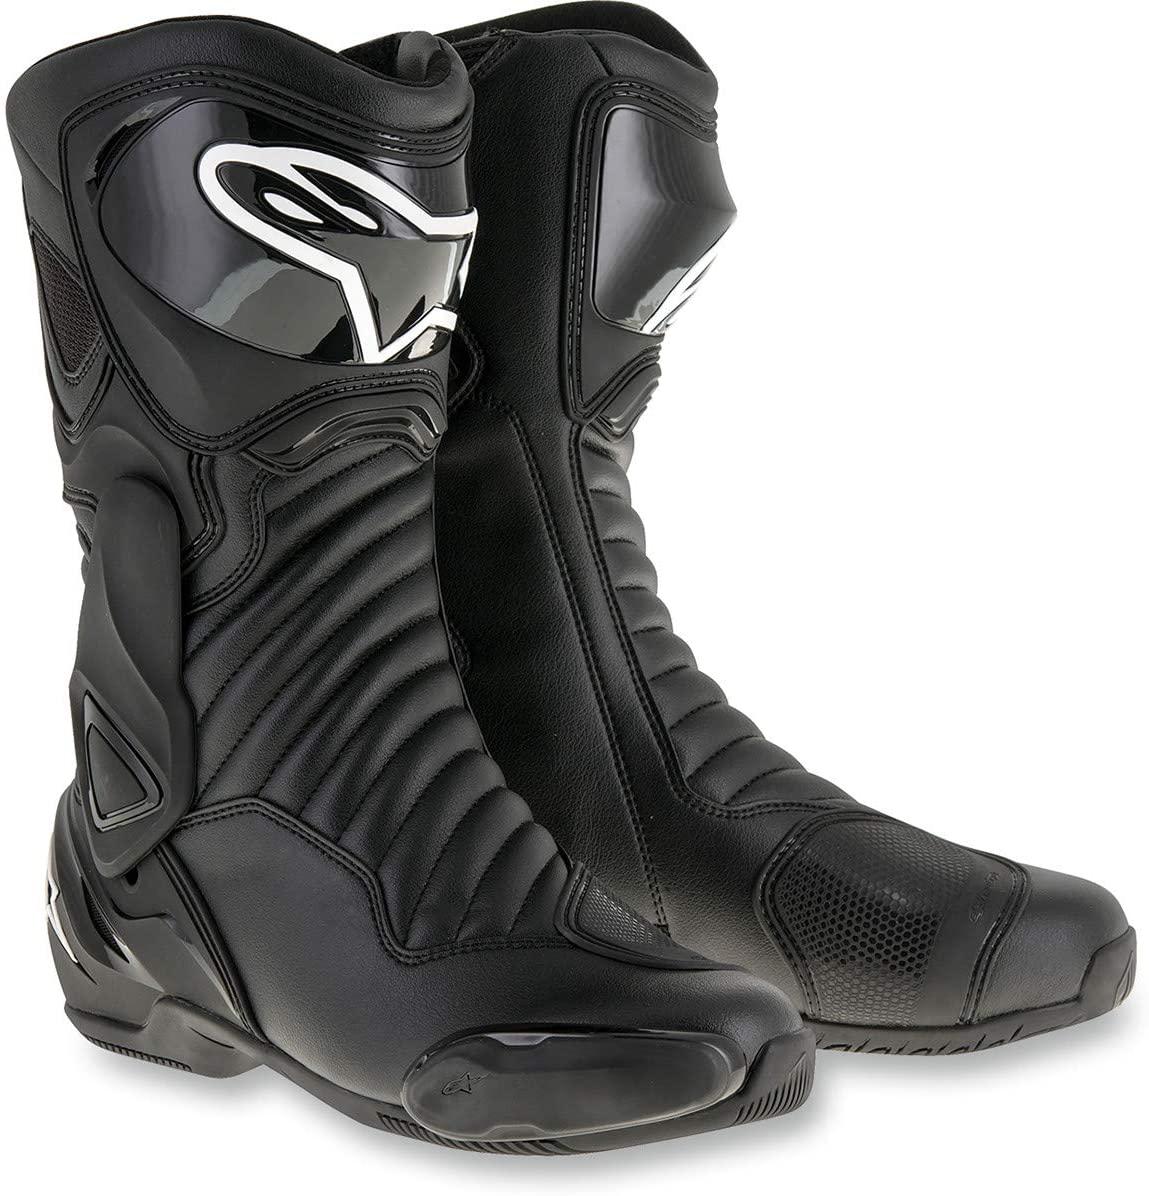 Alpinestars Men's 2223017-1100-50 Boots Black, Size 50